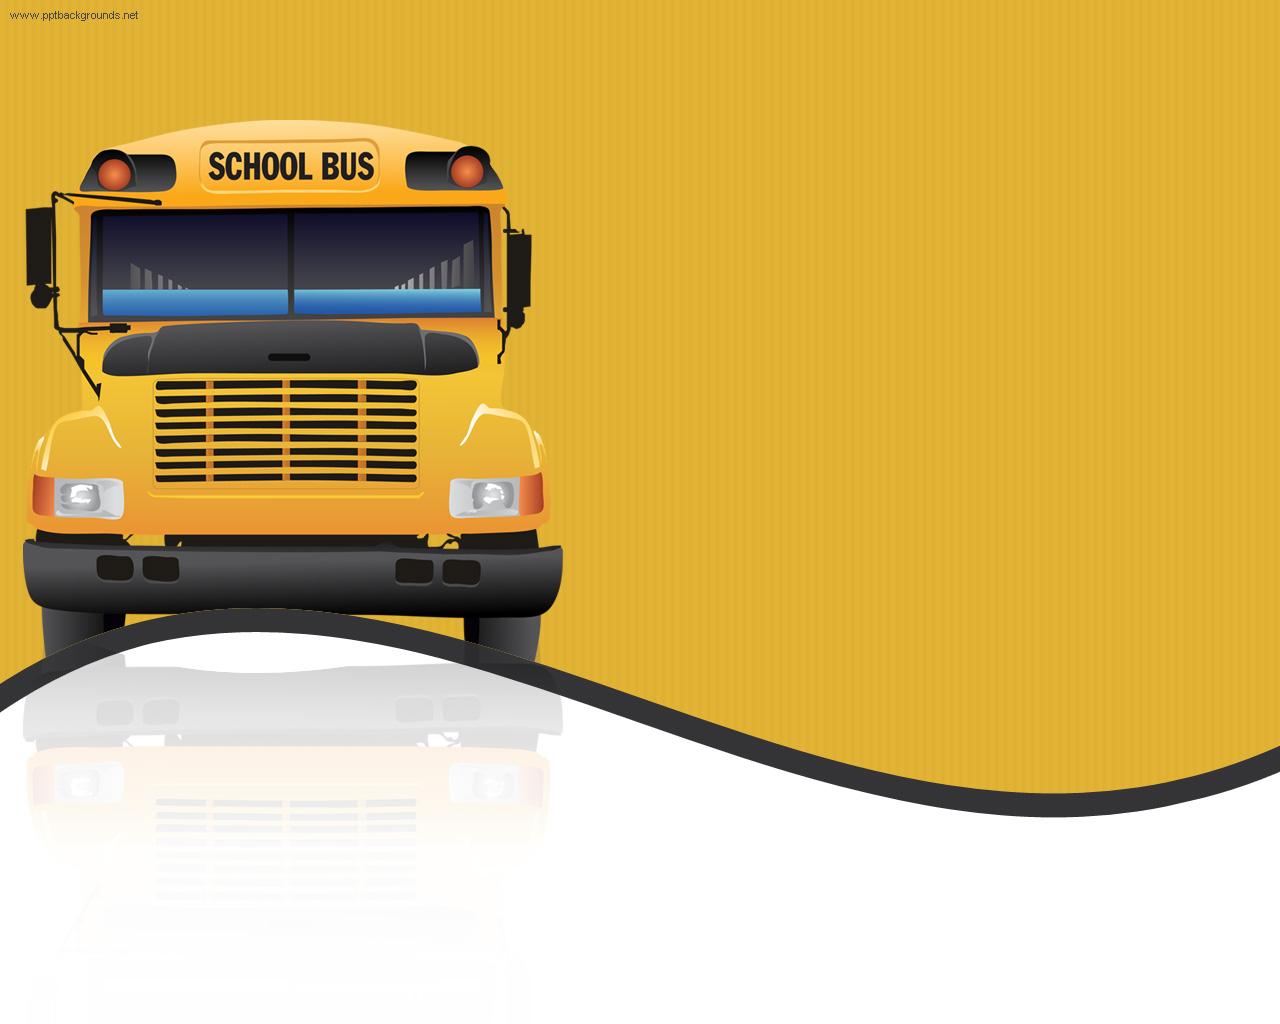 free school bus wallpaper wallpapersafari School Bus Clip Art Peanuts Movie 2015 Clip Art